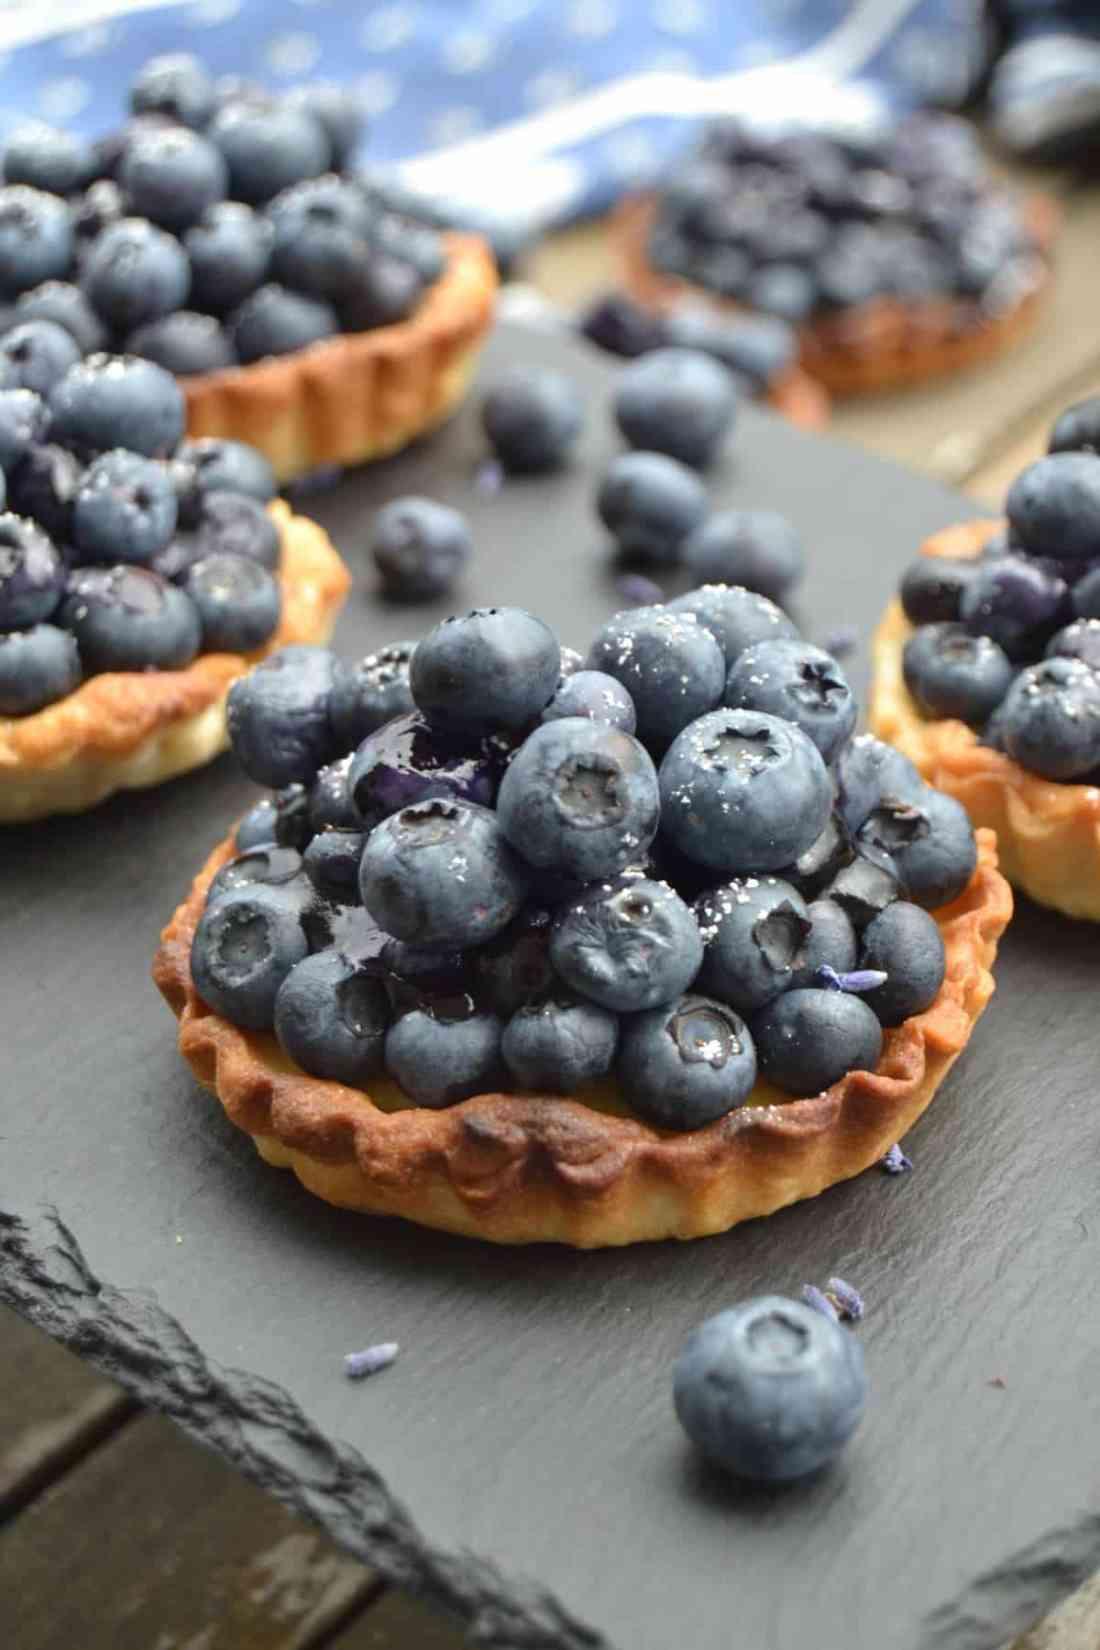 Tartelettes-aux-myrtilles-blaubeer-tartelettes-